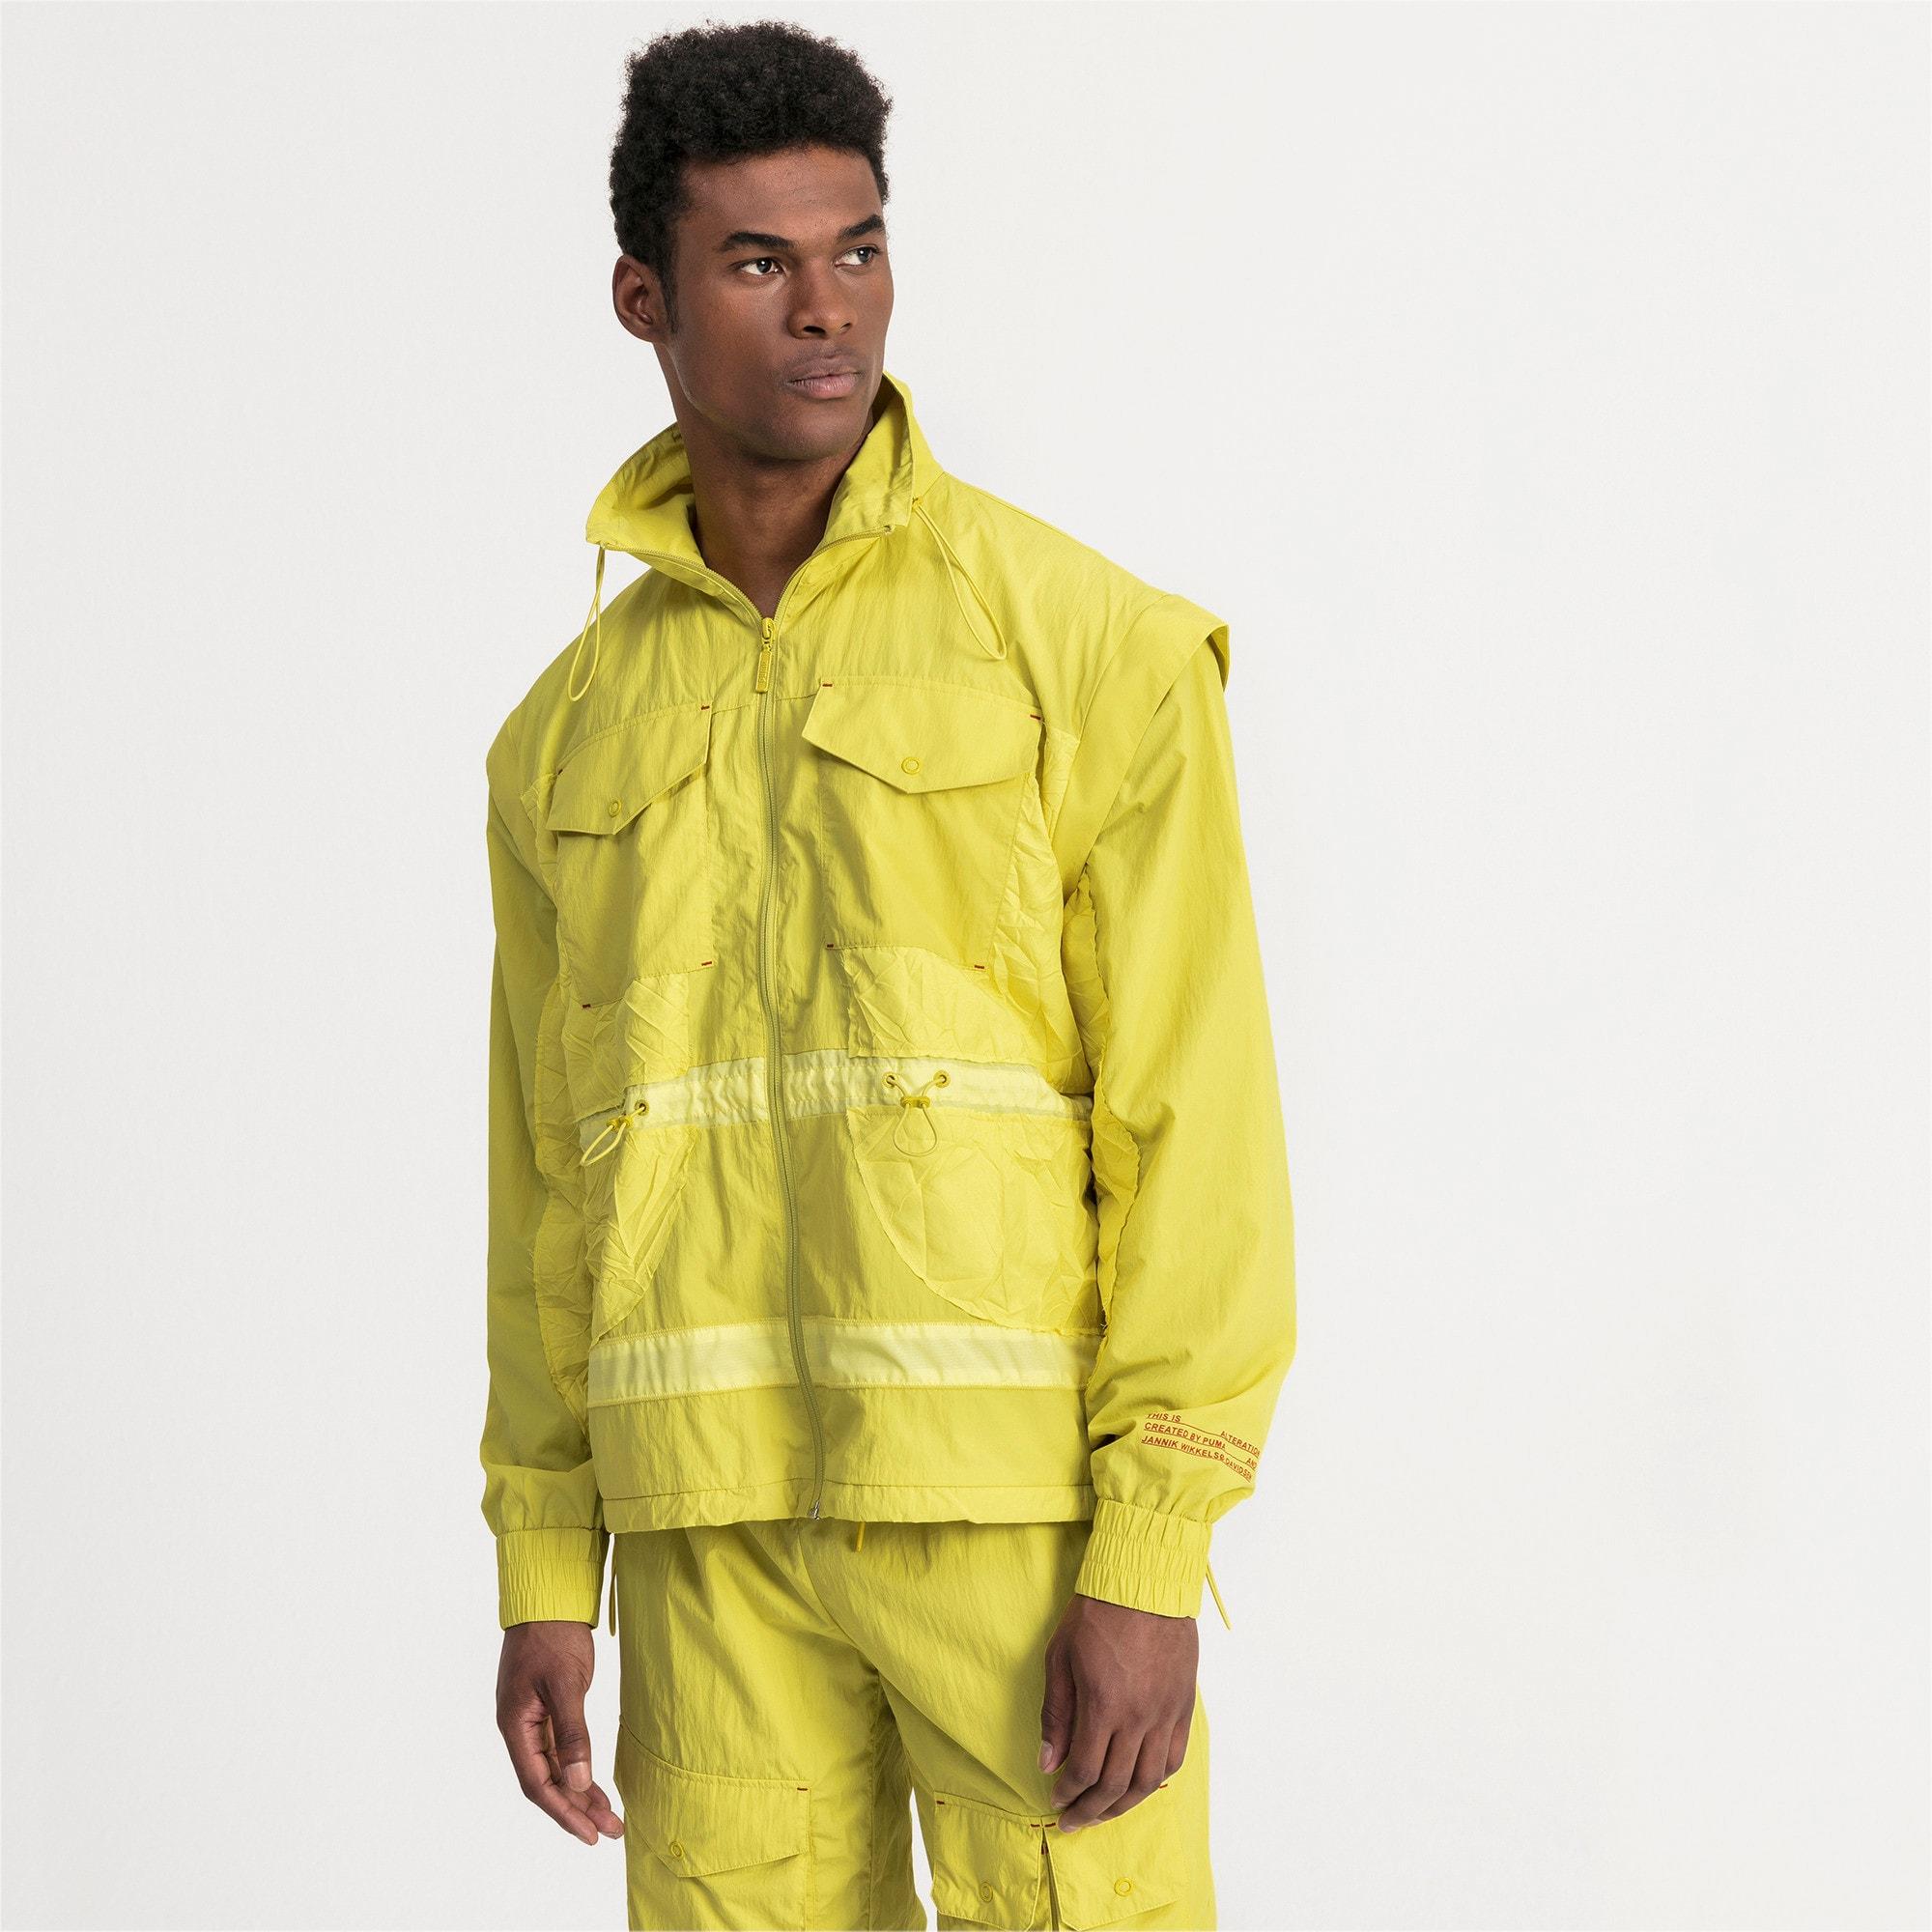 Thumbnail 1 of Alteration Men's Jacket, Celery, medium